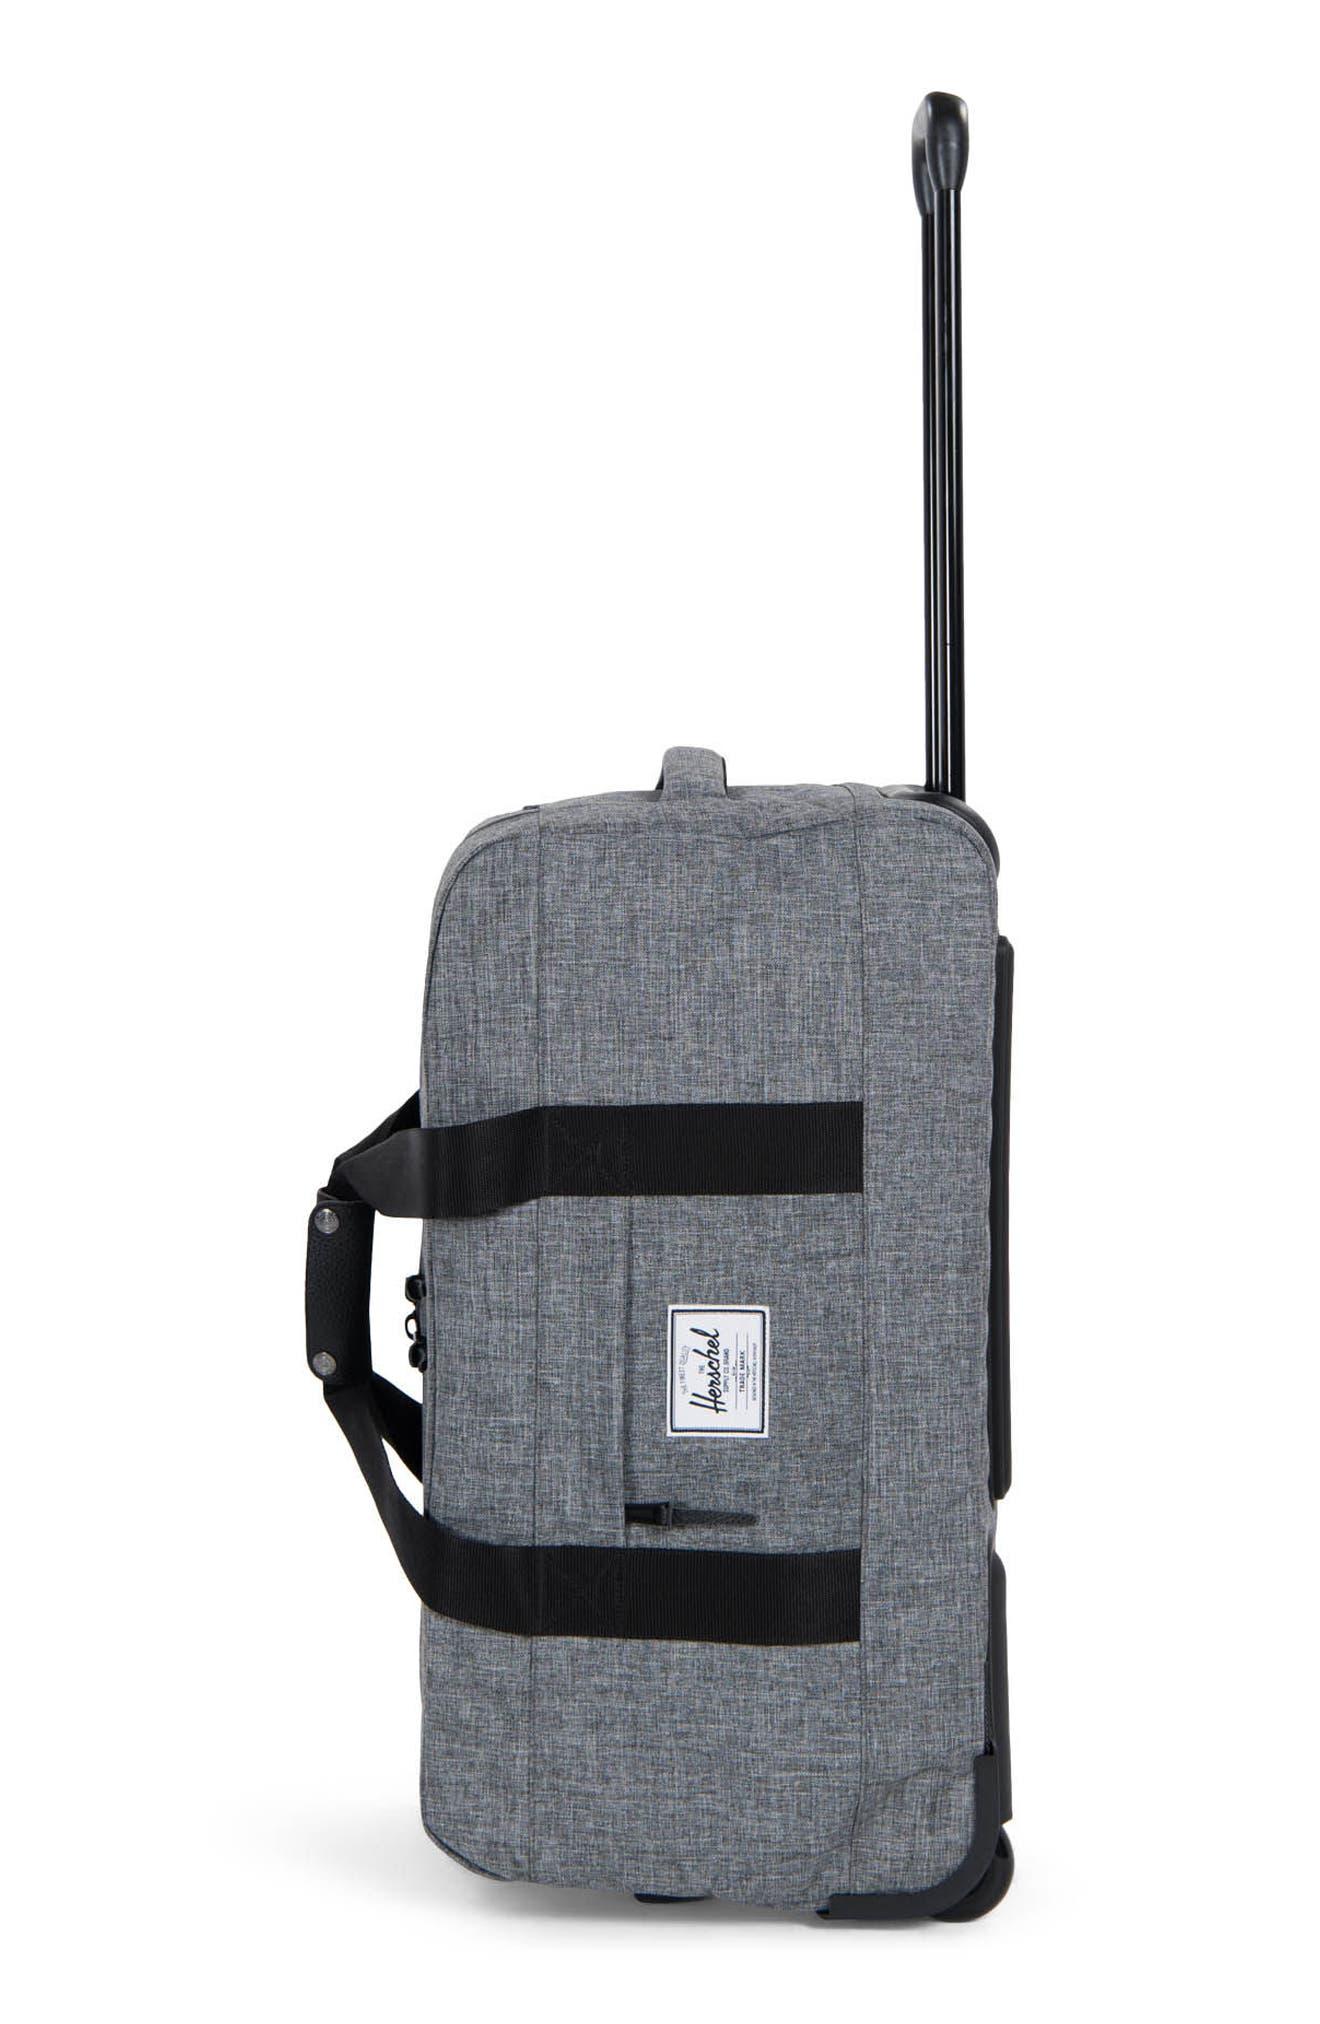 Wheelie Outfitter 24-Inch Duffel Bag,                             Alternate thumbnail 2, color,                             Raven Crosshatch